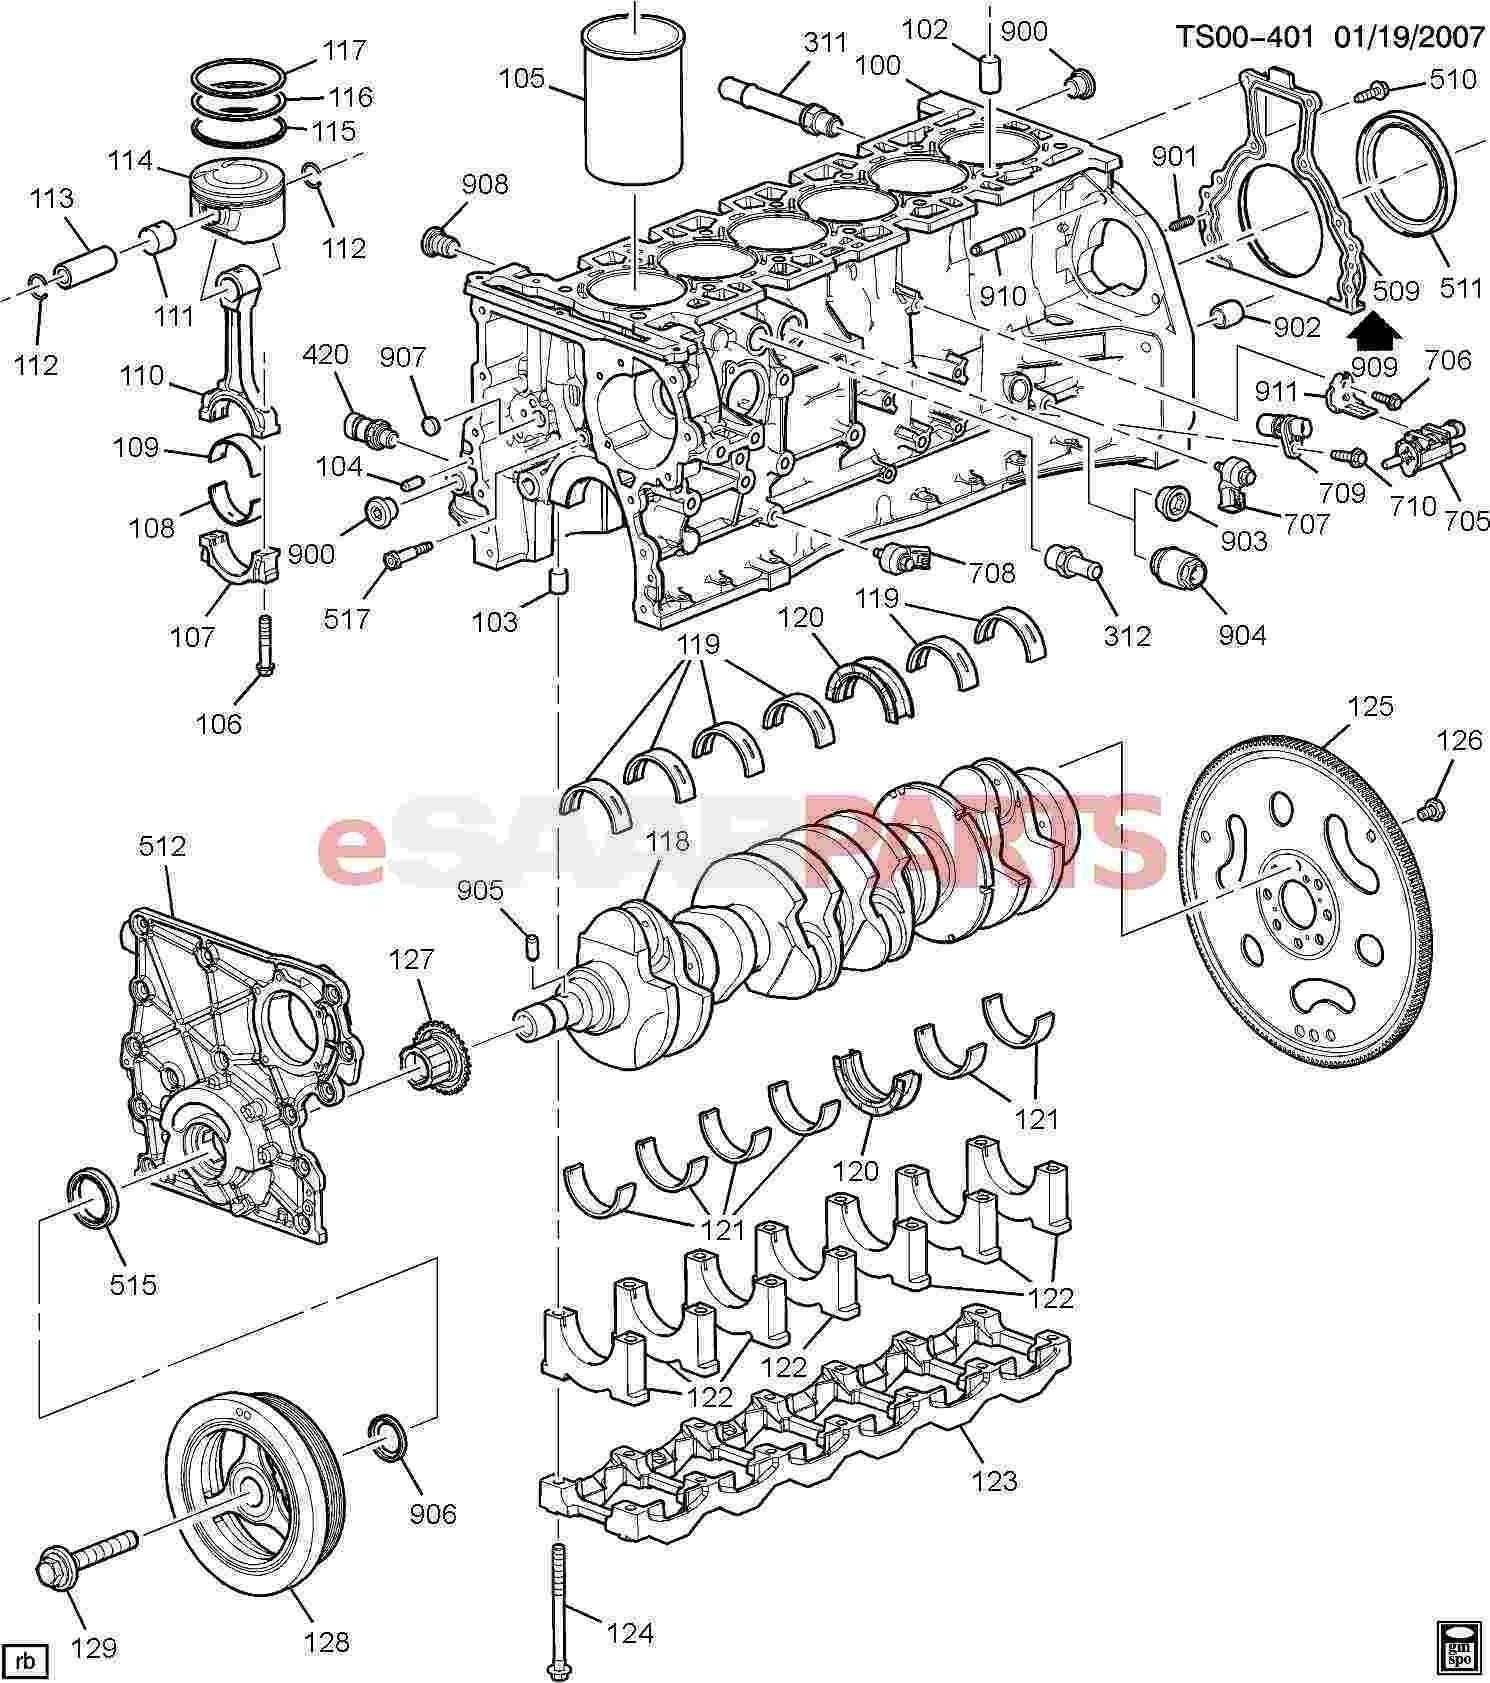 Chevy 3 1 Engine Diagram Wiring Diagrams My Relay 109 Blazer Inspirationa 2003 Of